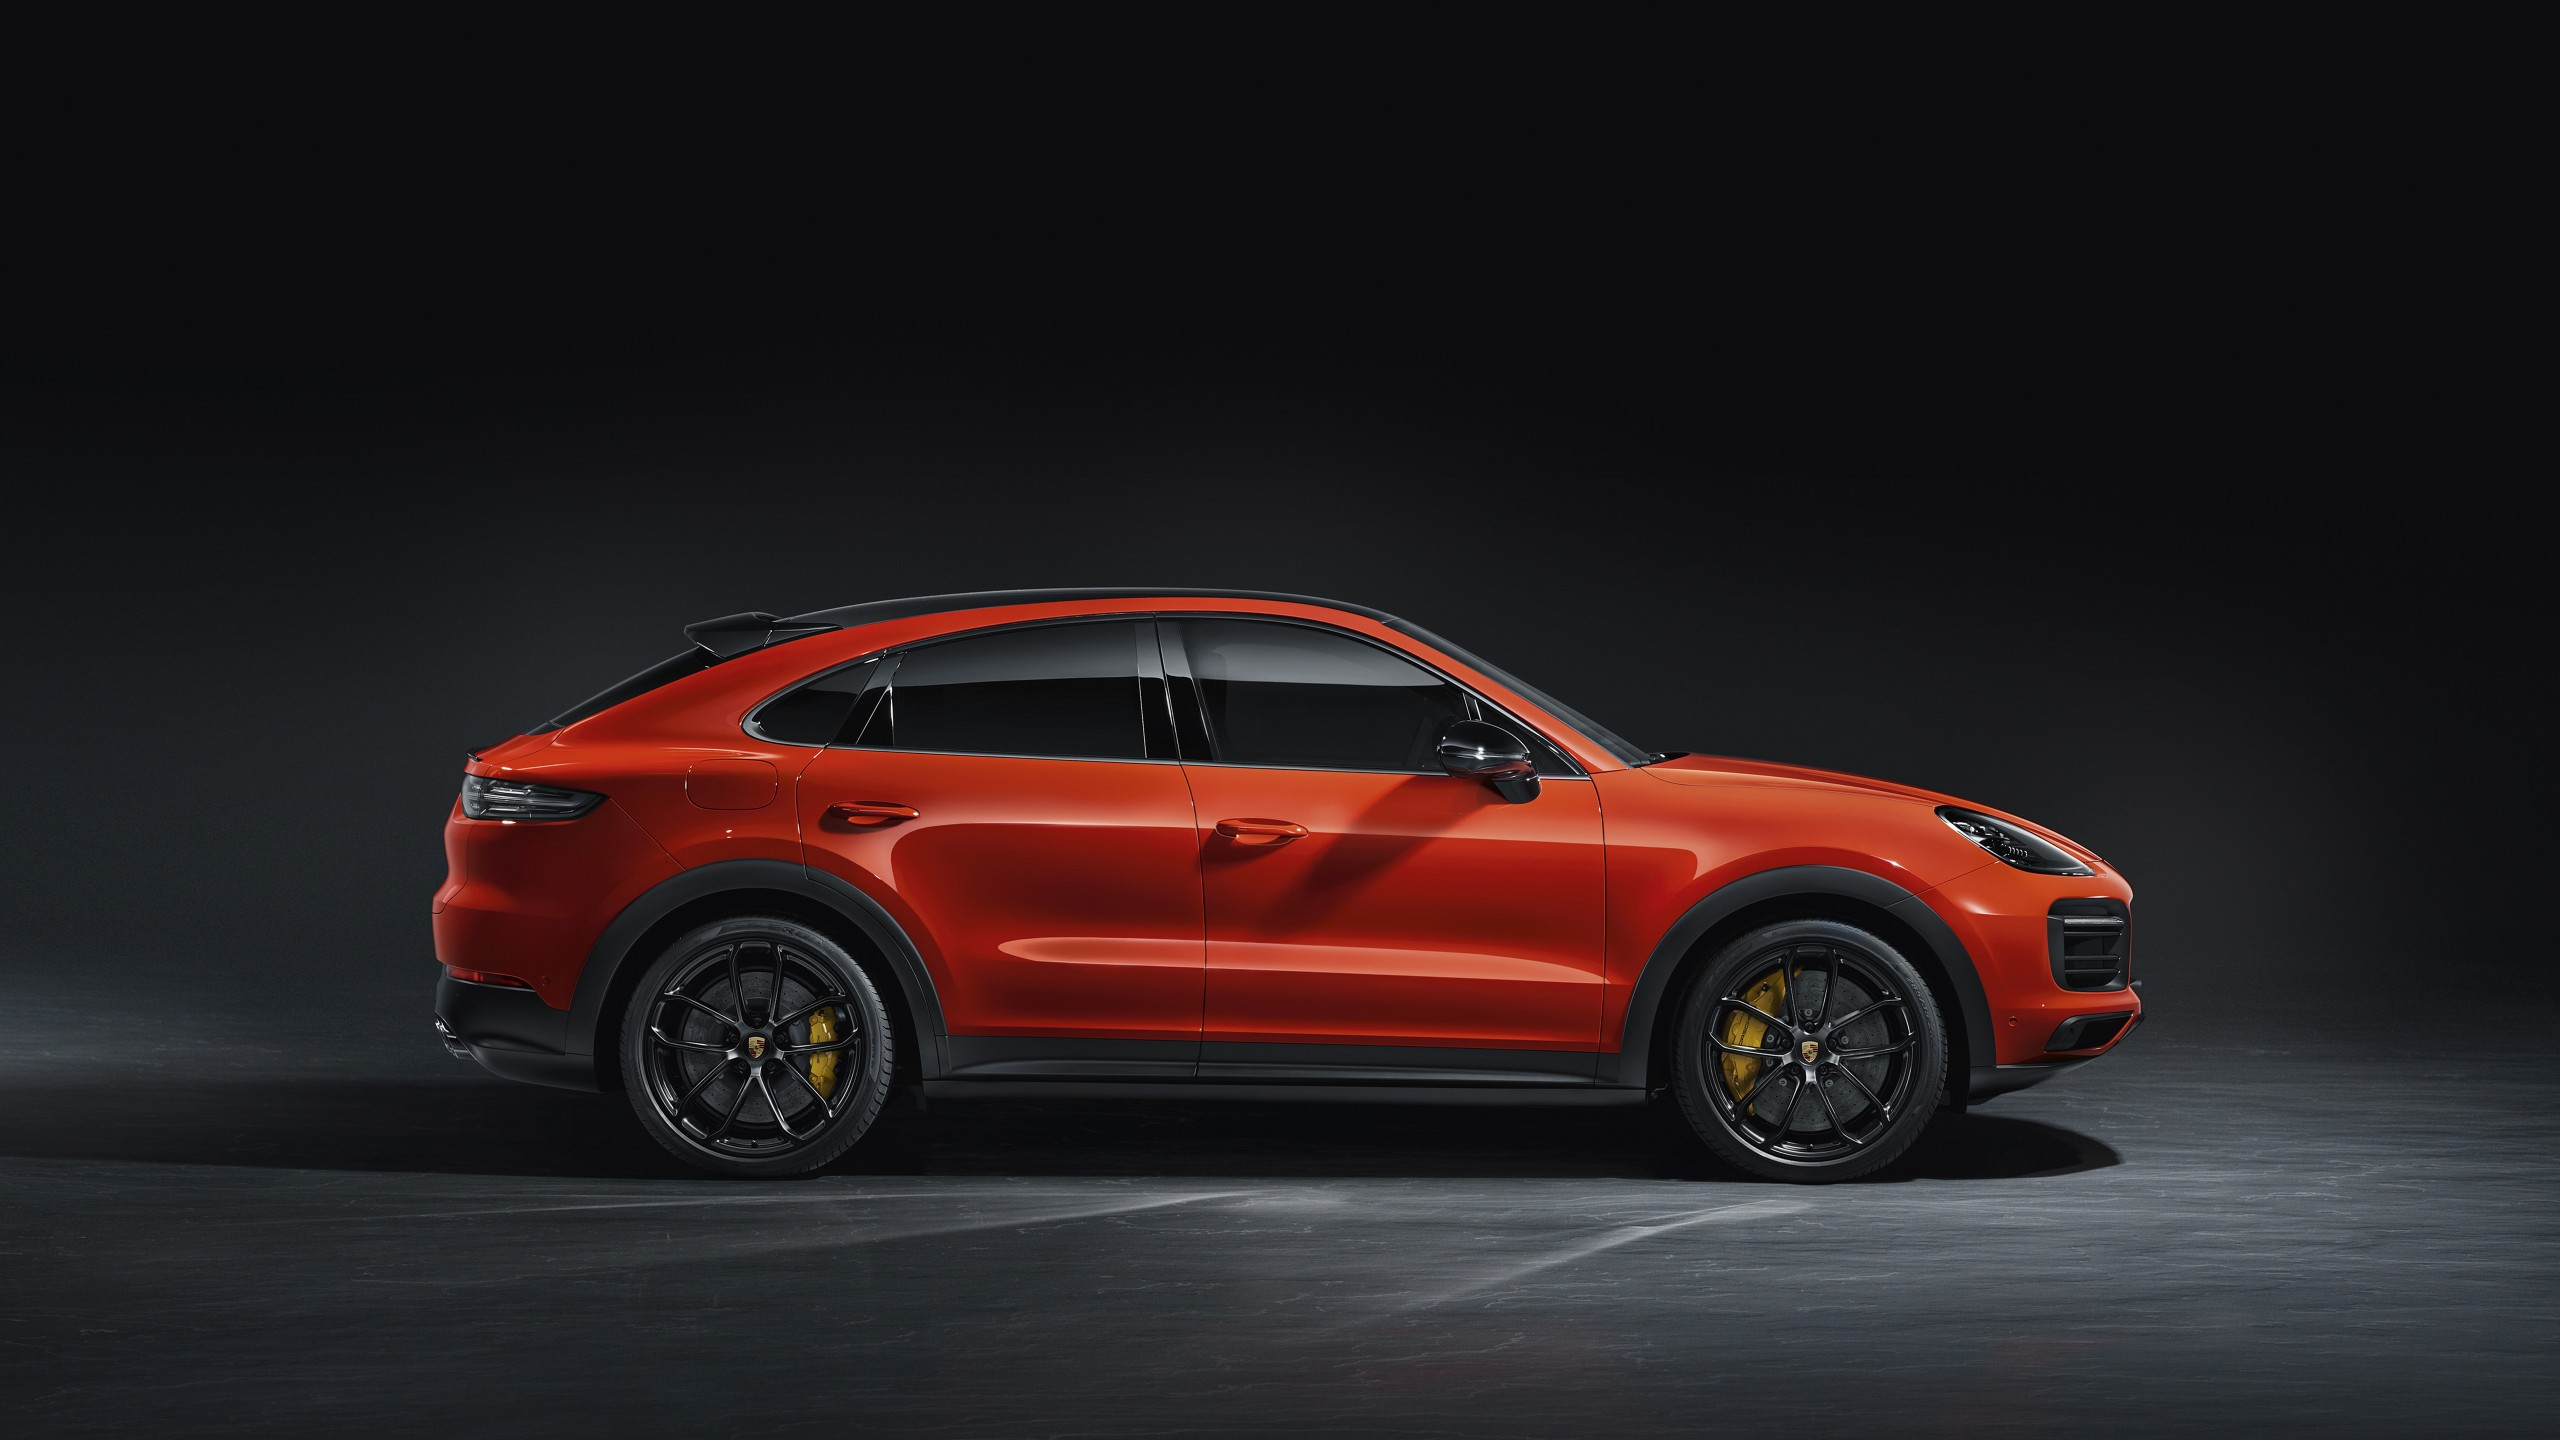 Porsche Cayenne Coupe 2019 4k 3 Wallpaper Hd Car